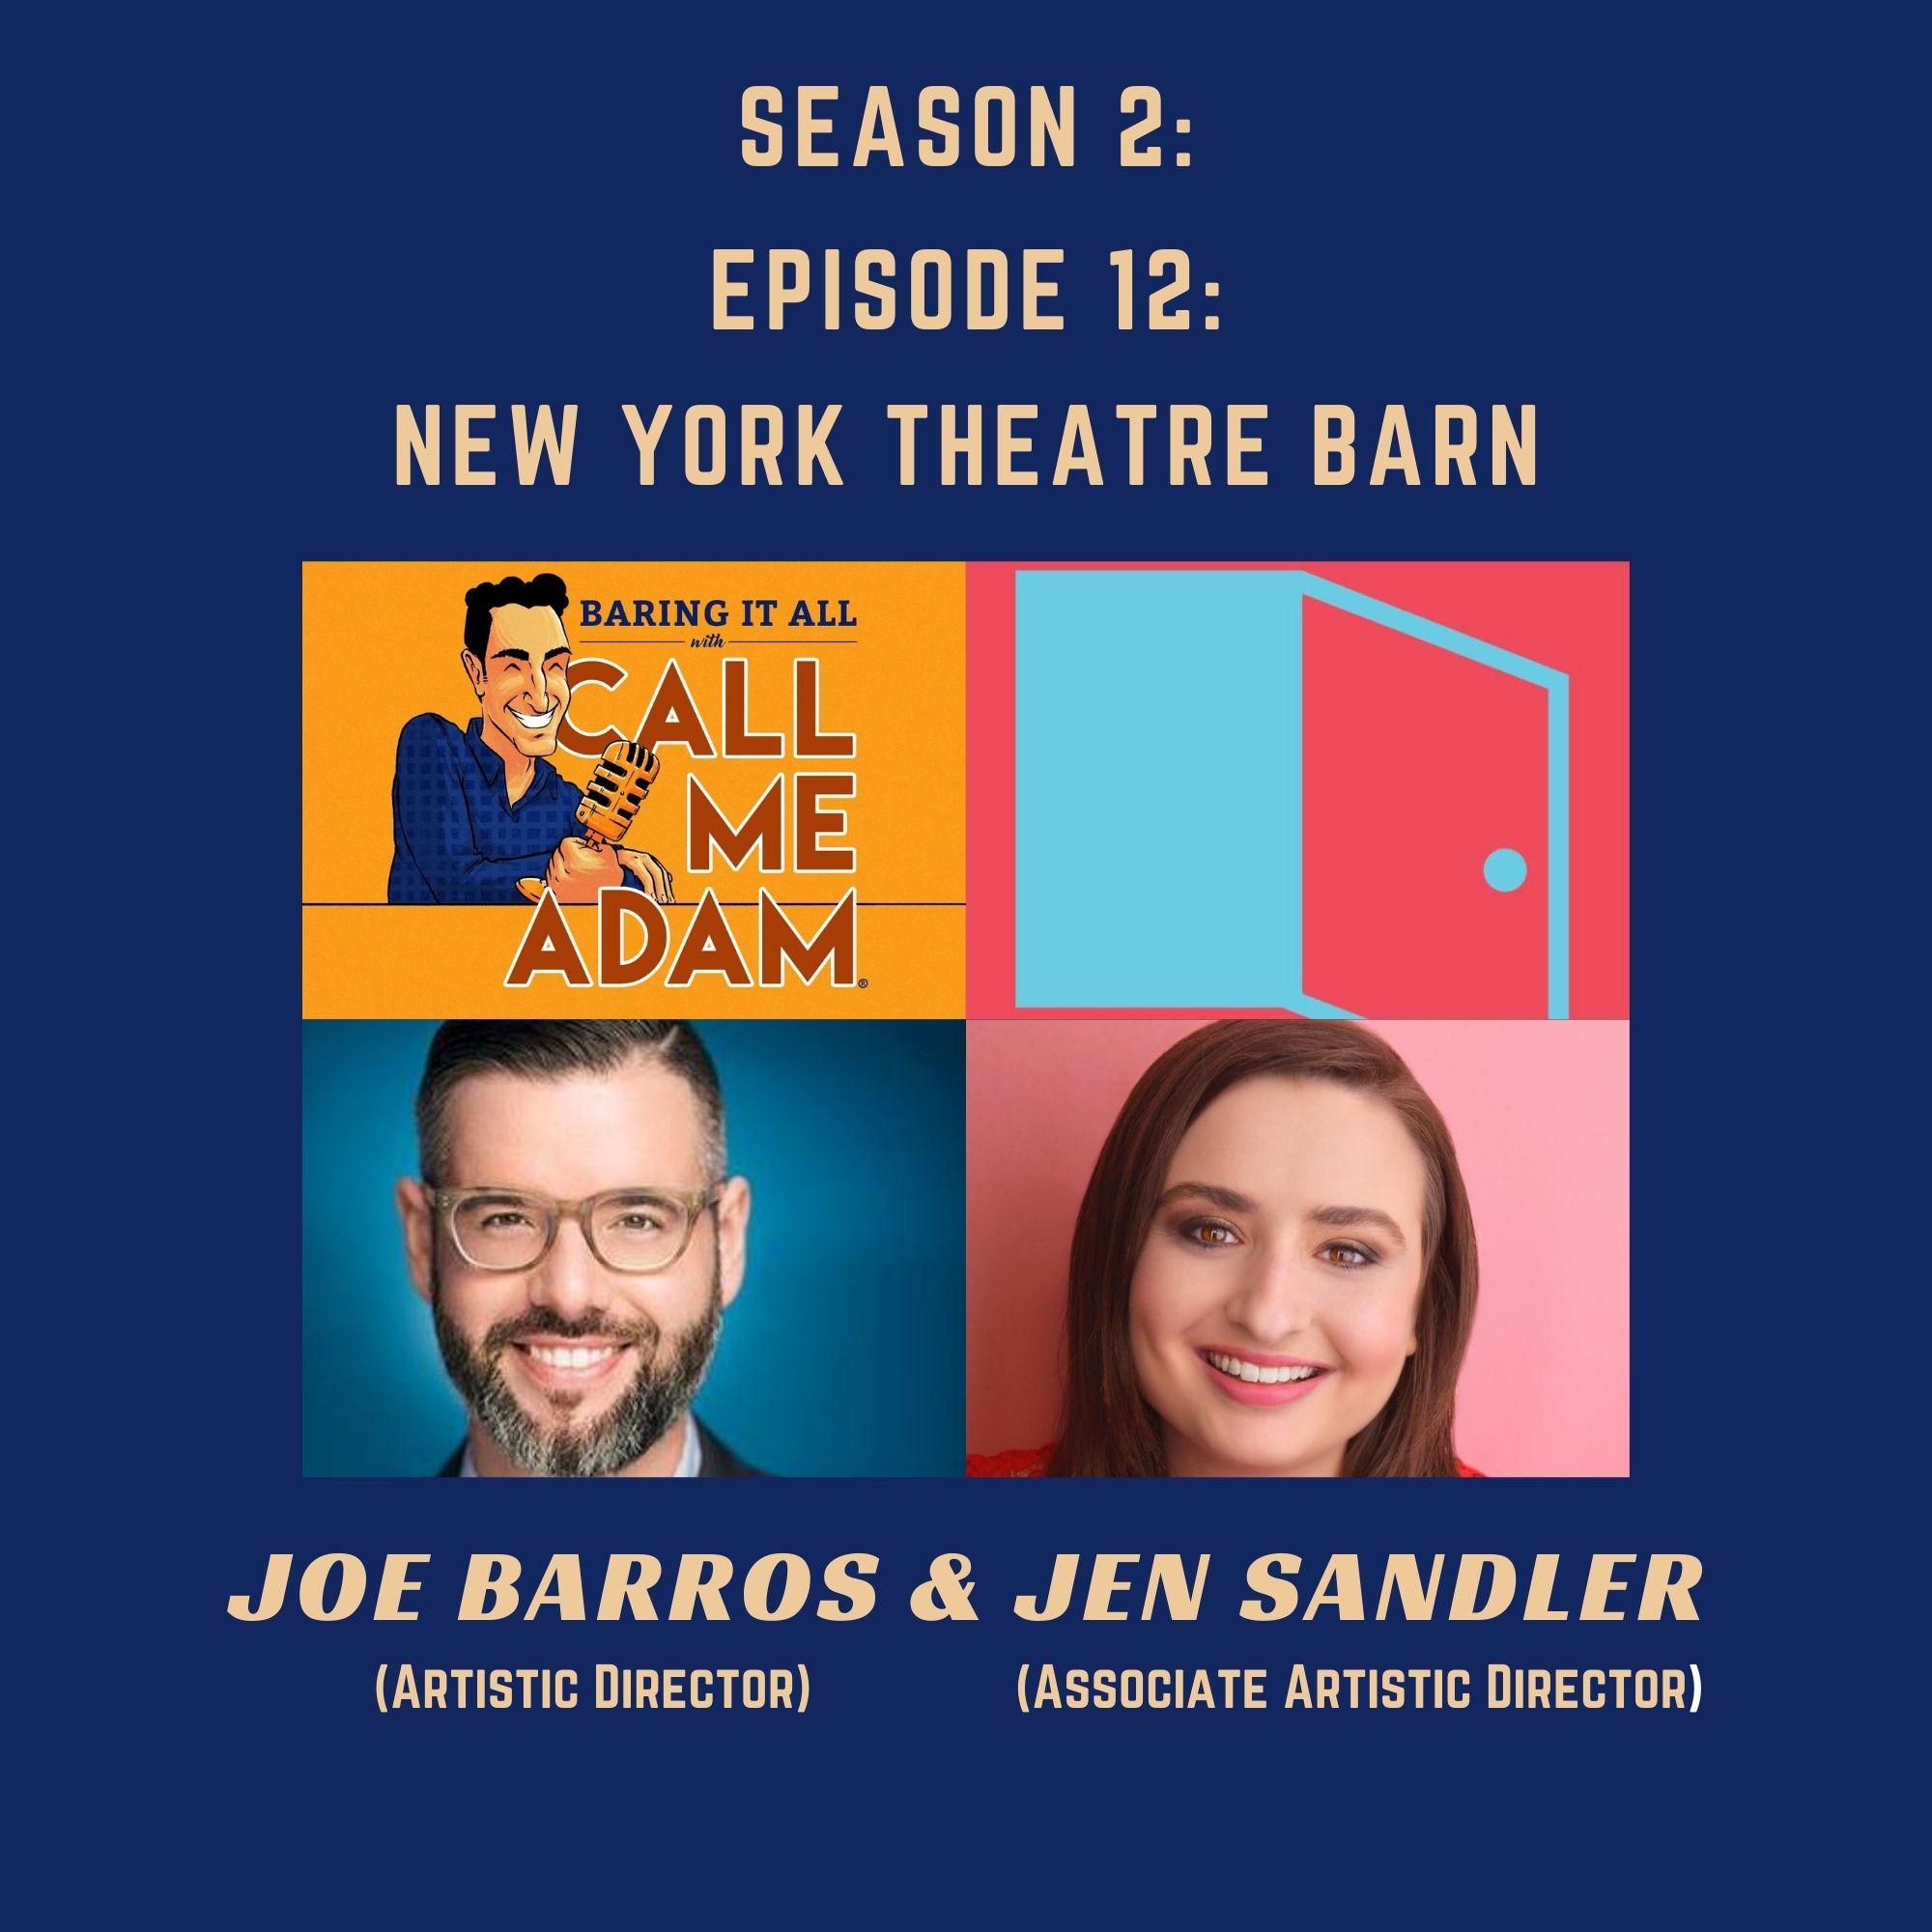 New York Theatre Barn Legacy